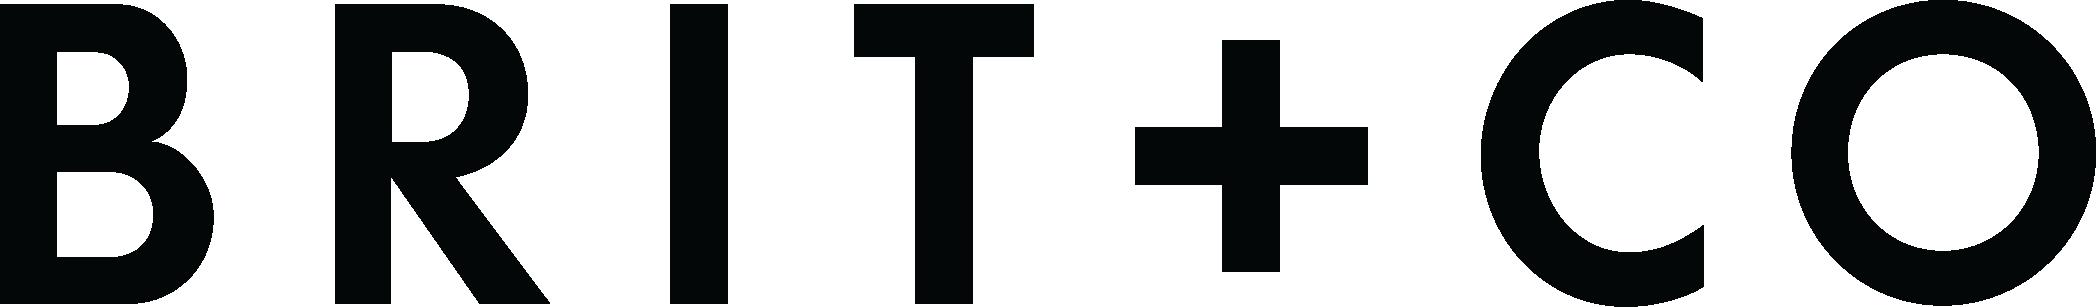 https://files.cleanfooddirtygirl.com/20201210191841/brit-co-logo.png